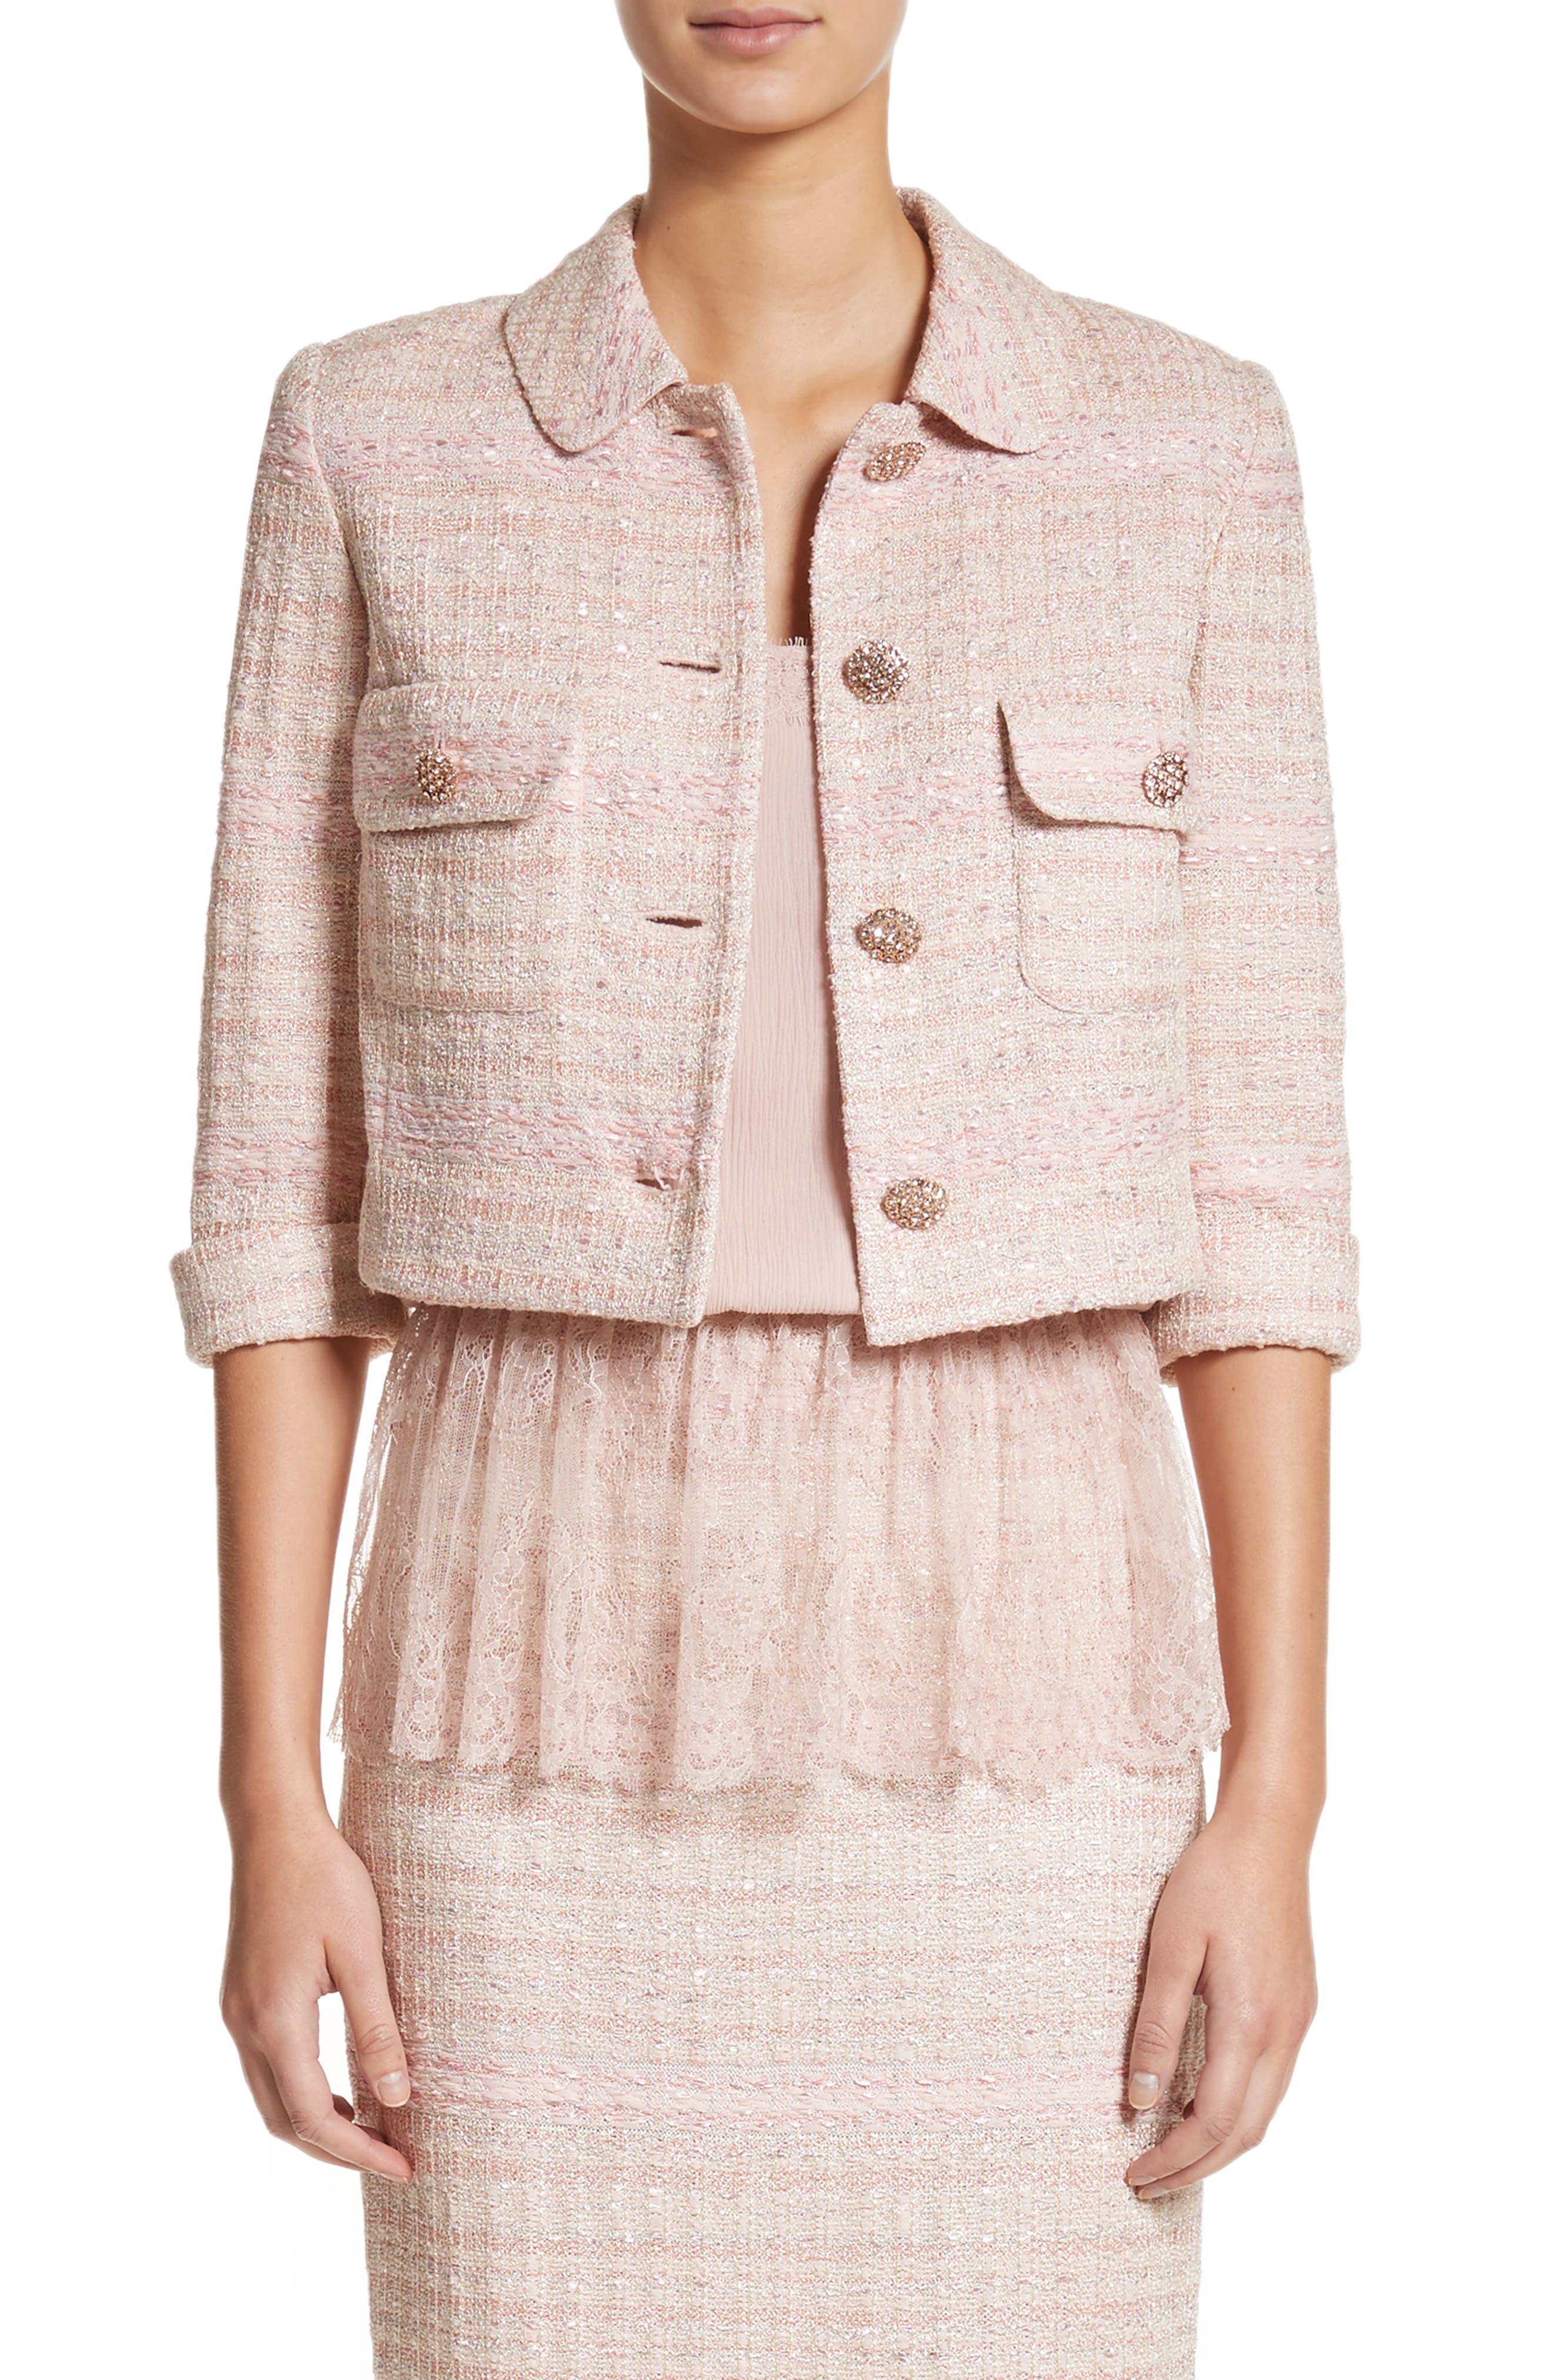 Guilded Pastel Knit Jacket,                         Main,                         color, Blush Multi